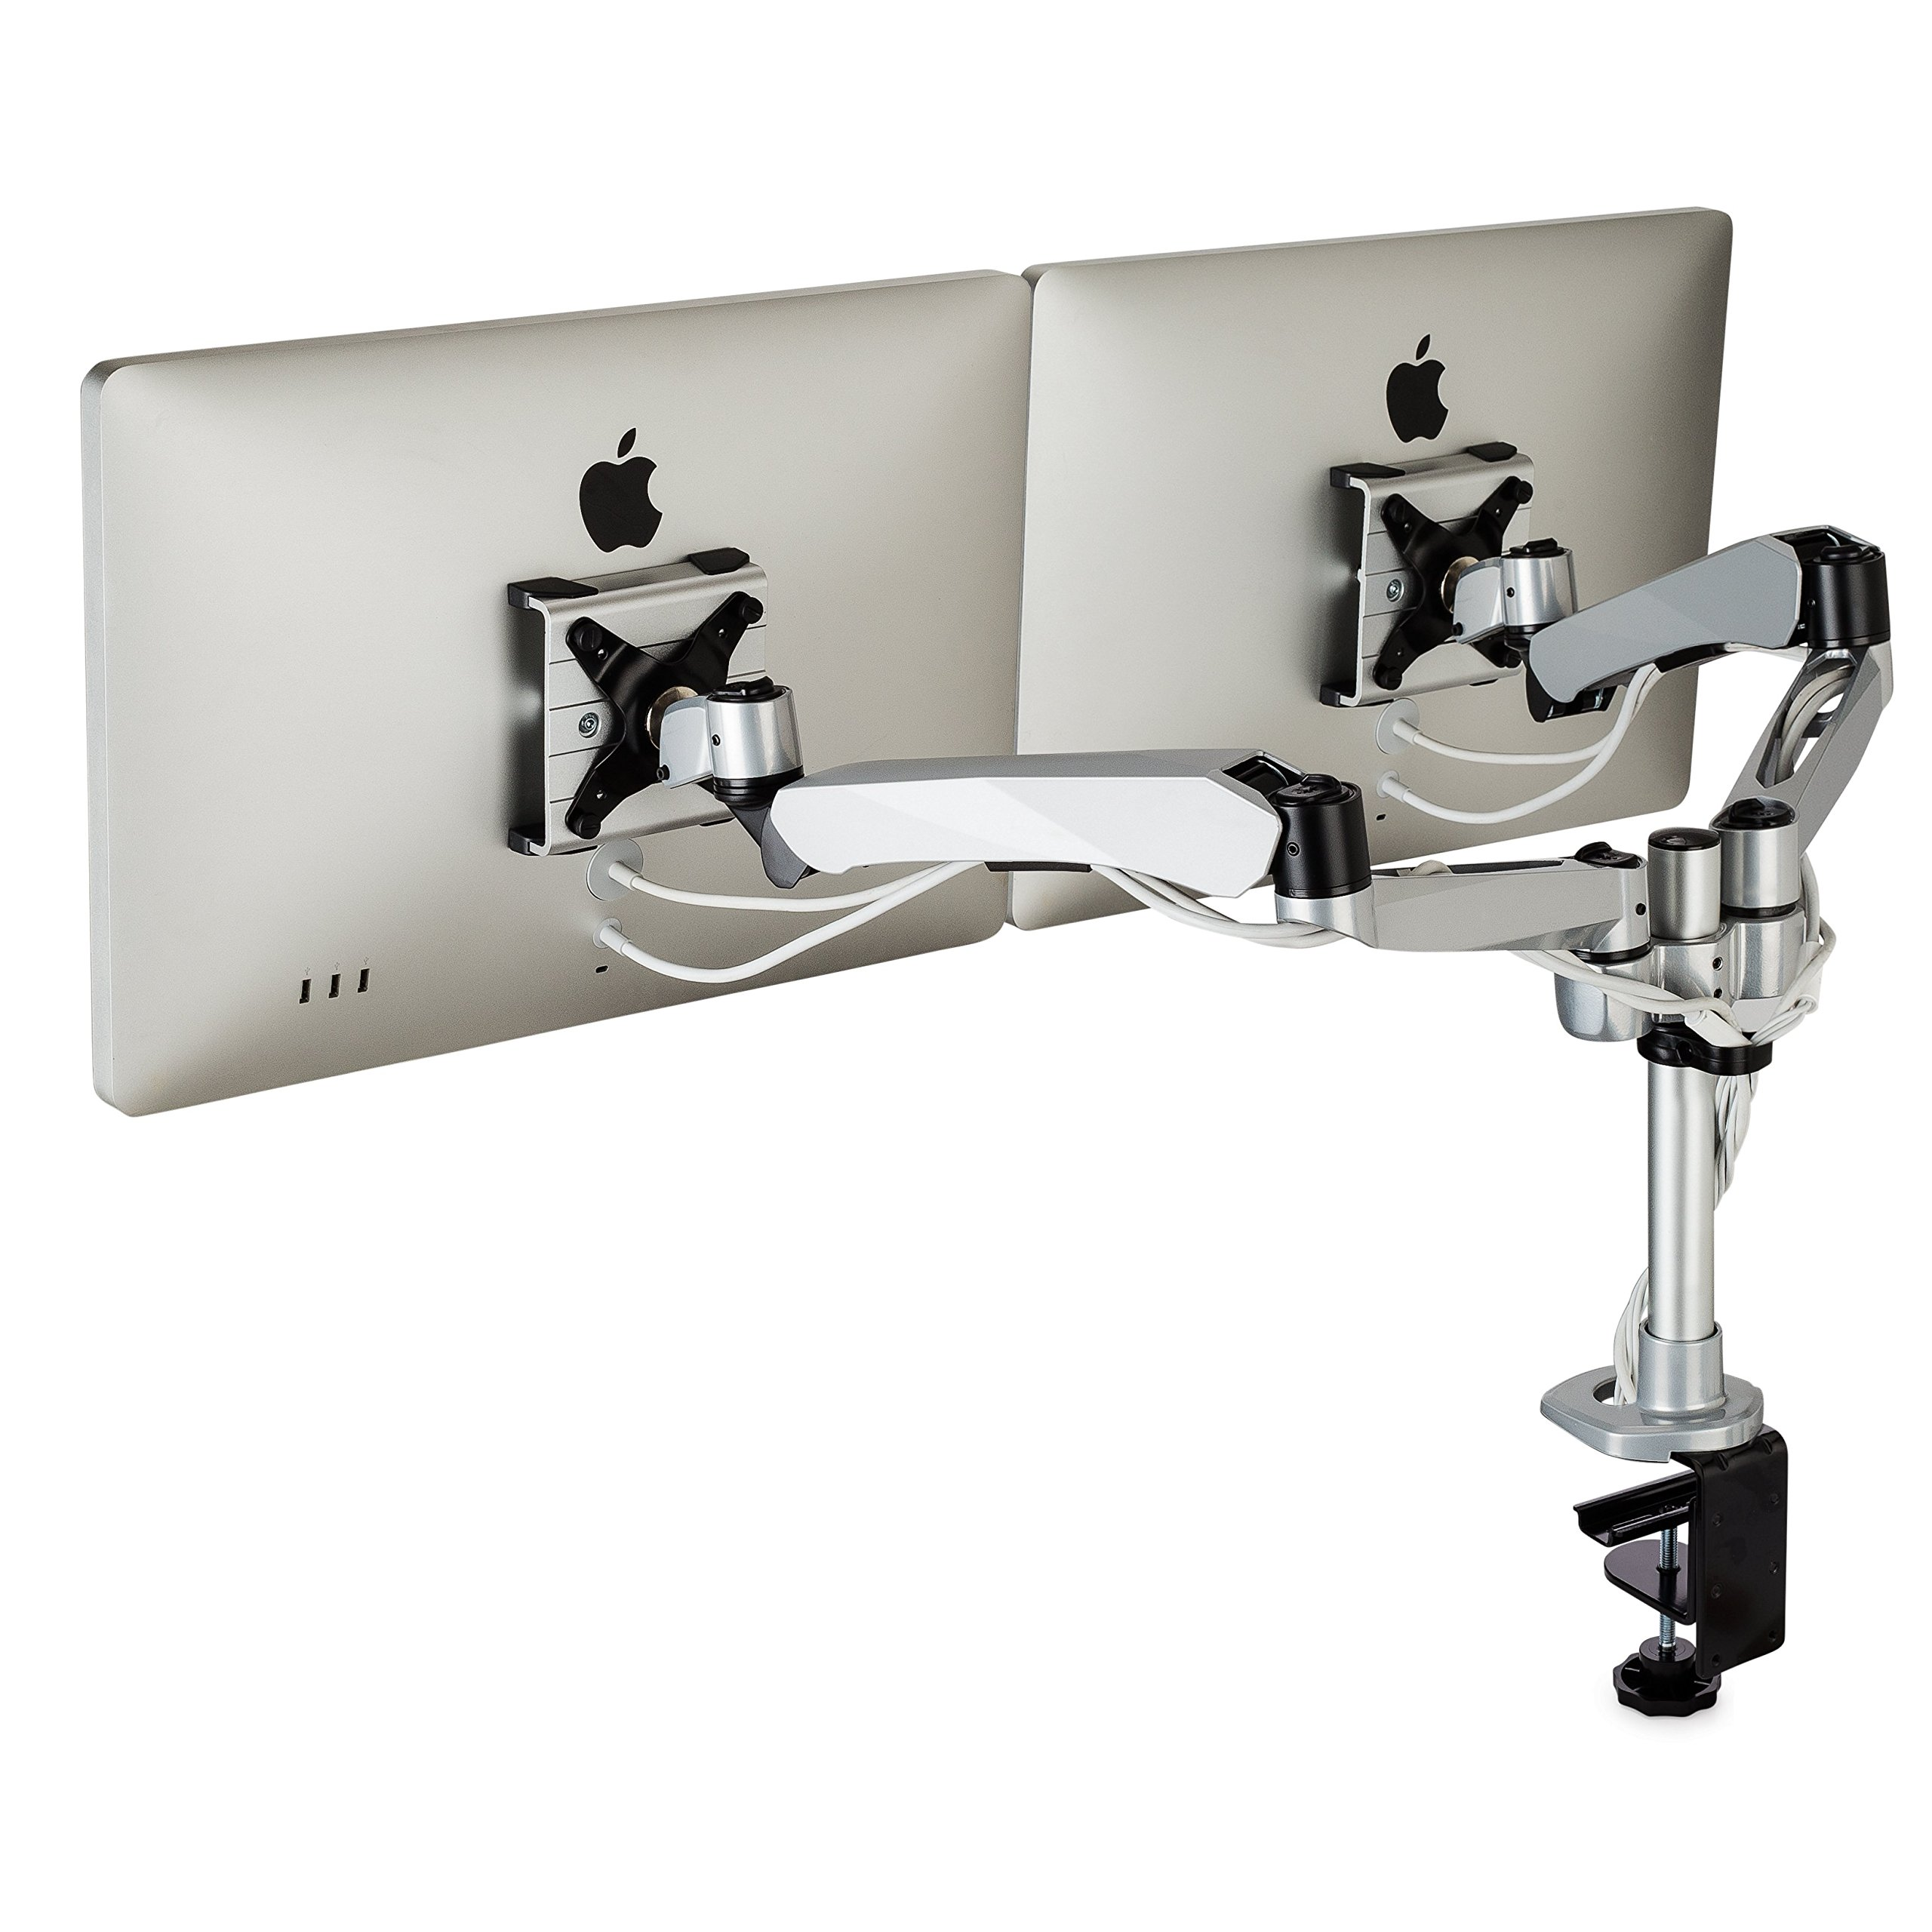 HumanCentric XT-Series Dual Monitor Display Mounting Arm | Premium Monitor Stand & VESA Mount | New 2018 Model